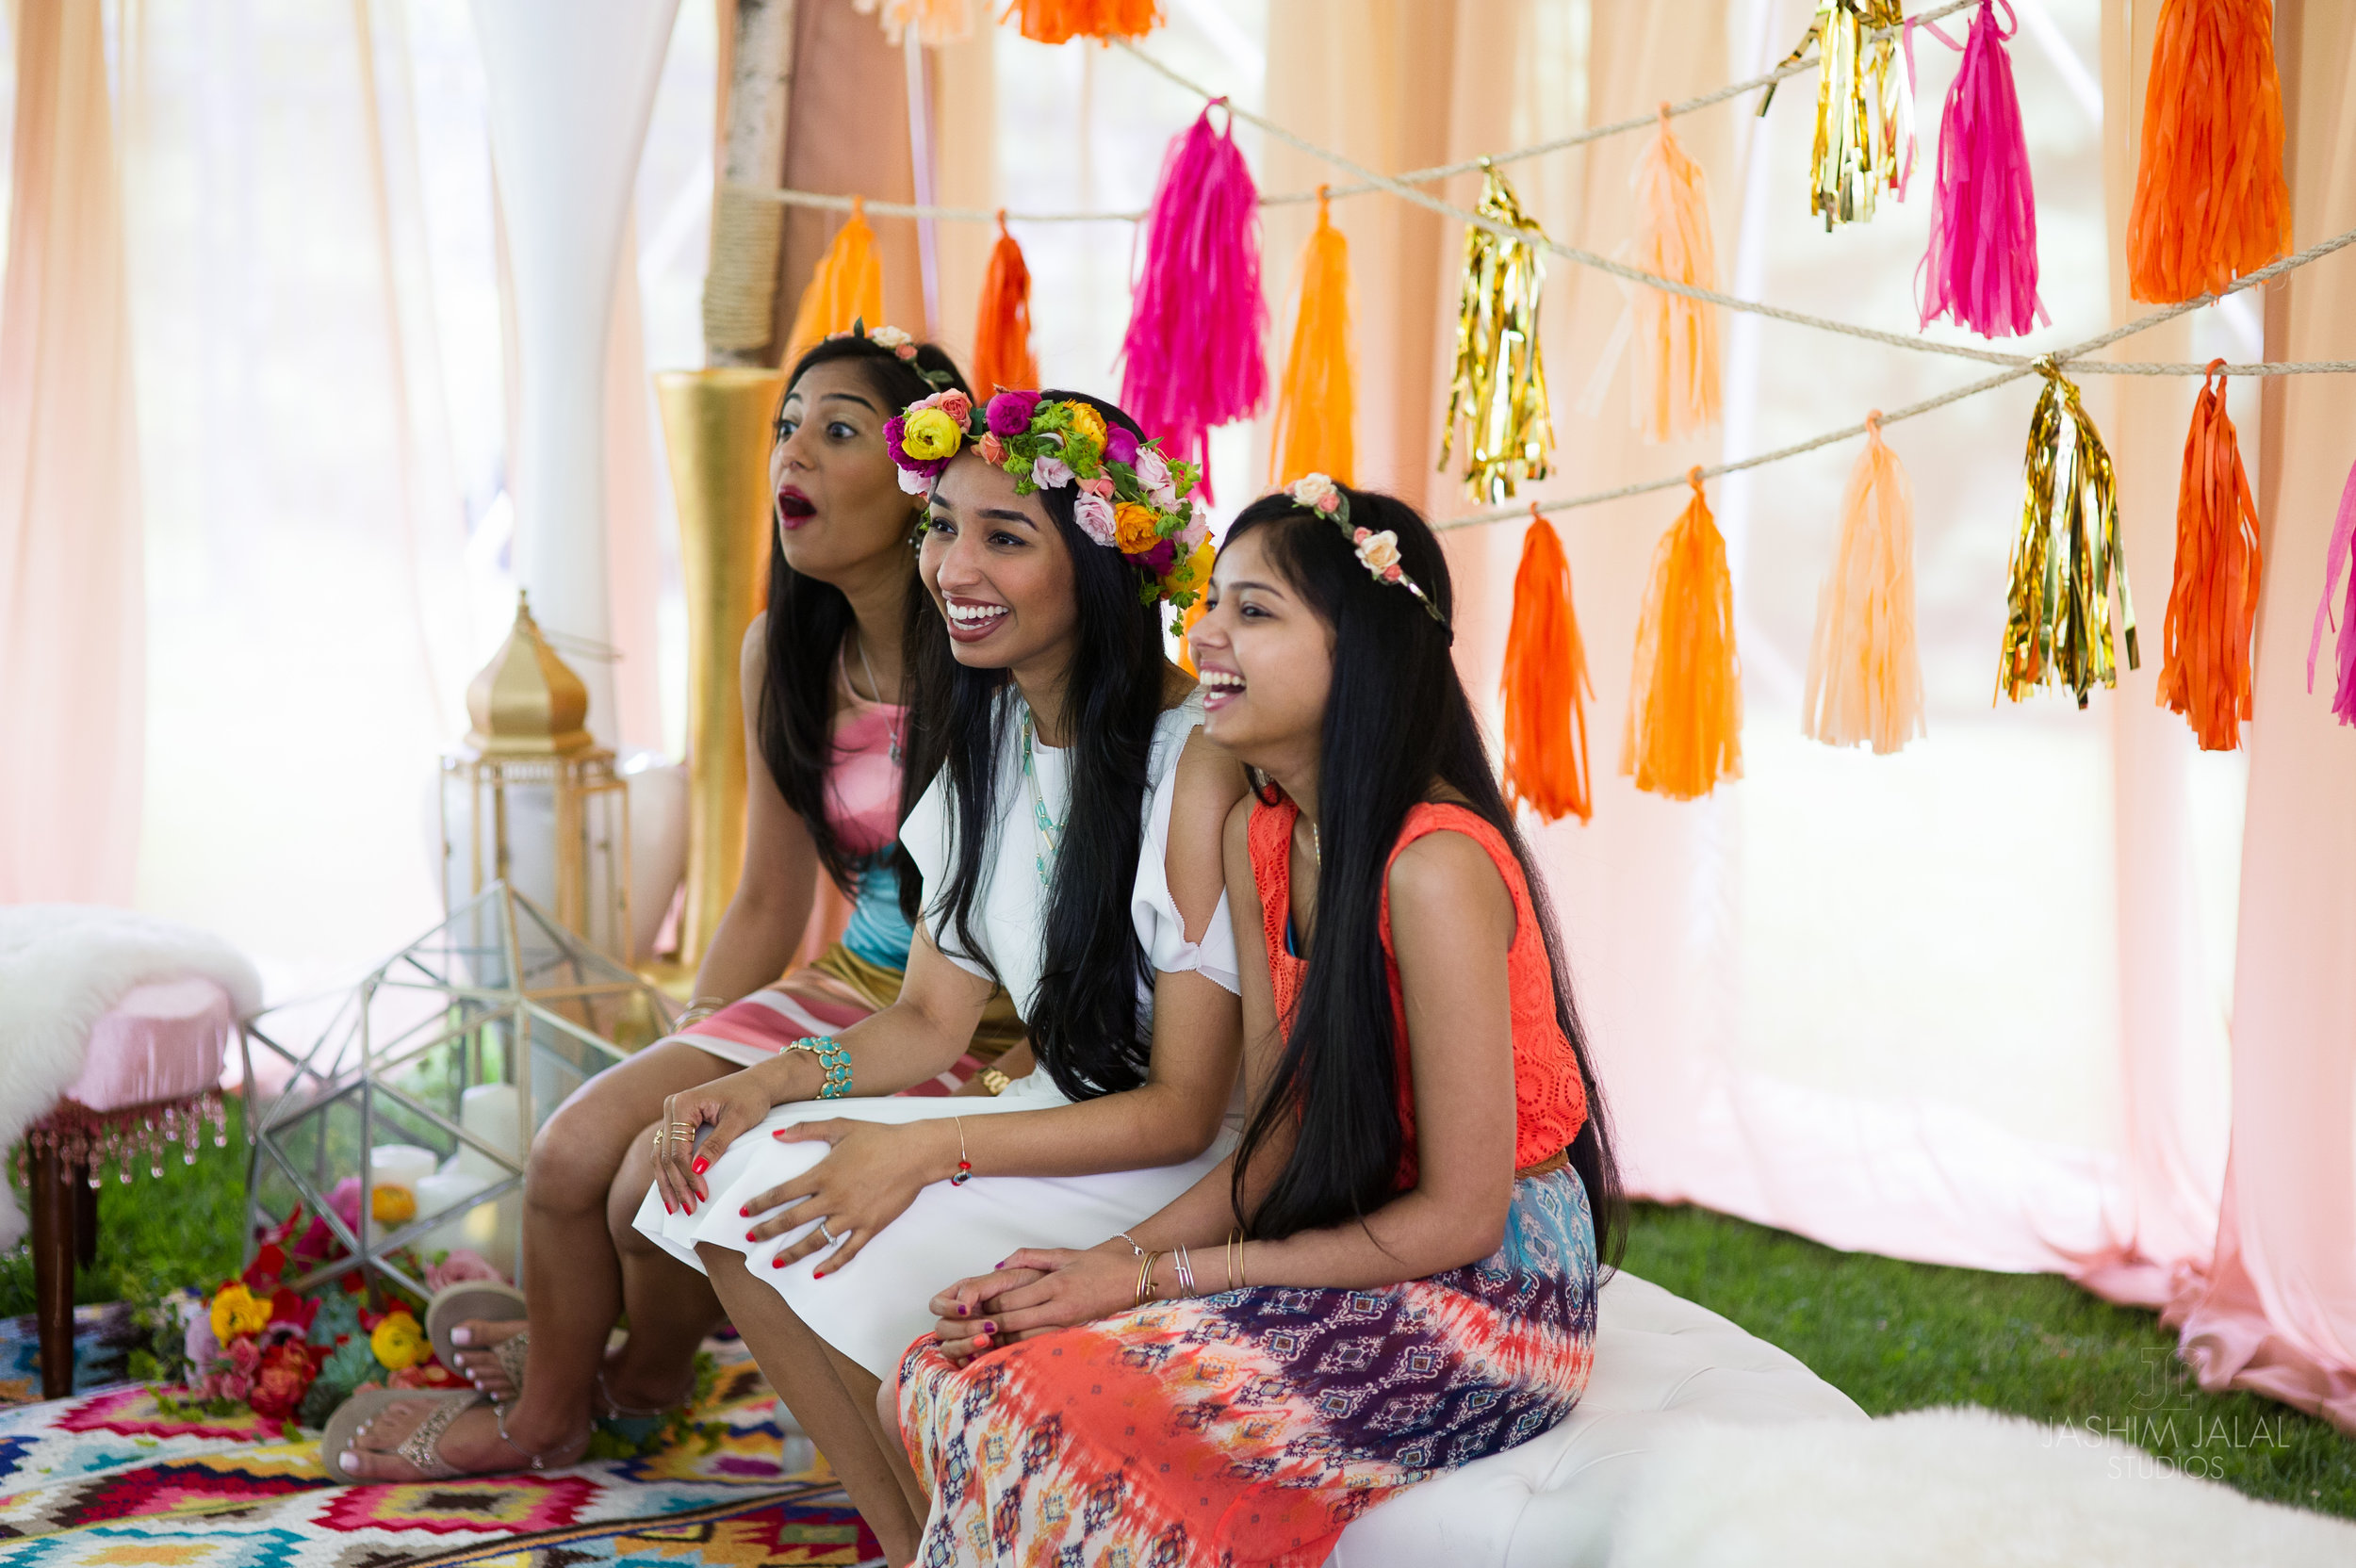 Indian Bridal Shower Boho Chic Summer Tent Event with Dancer (4).JPG